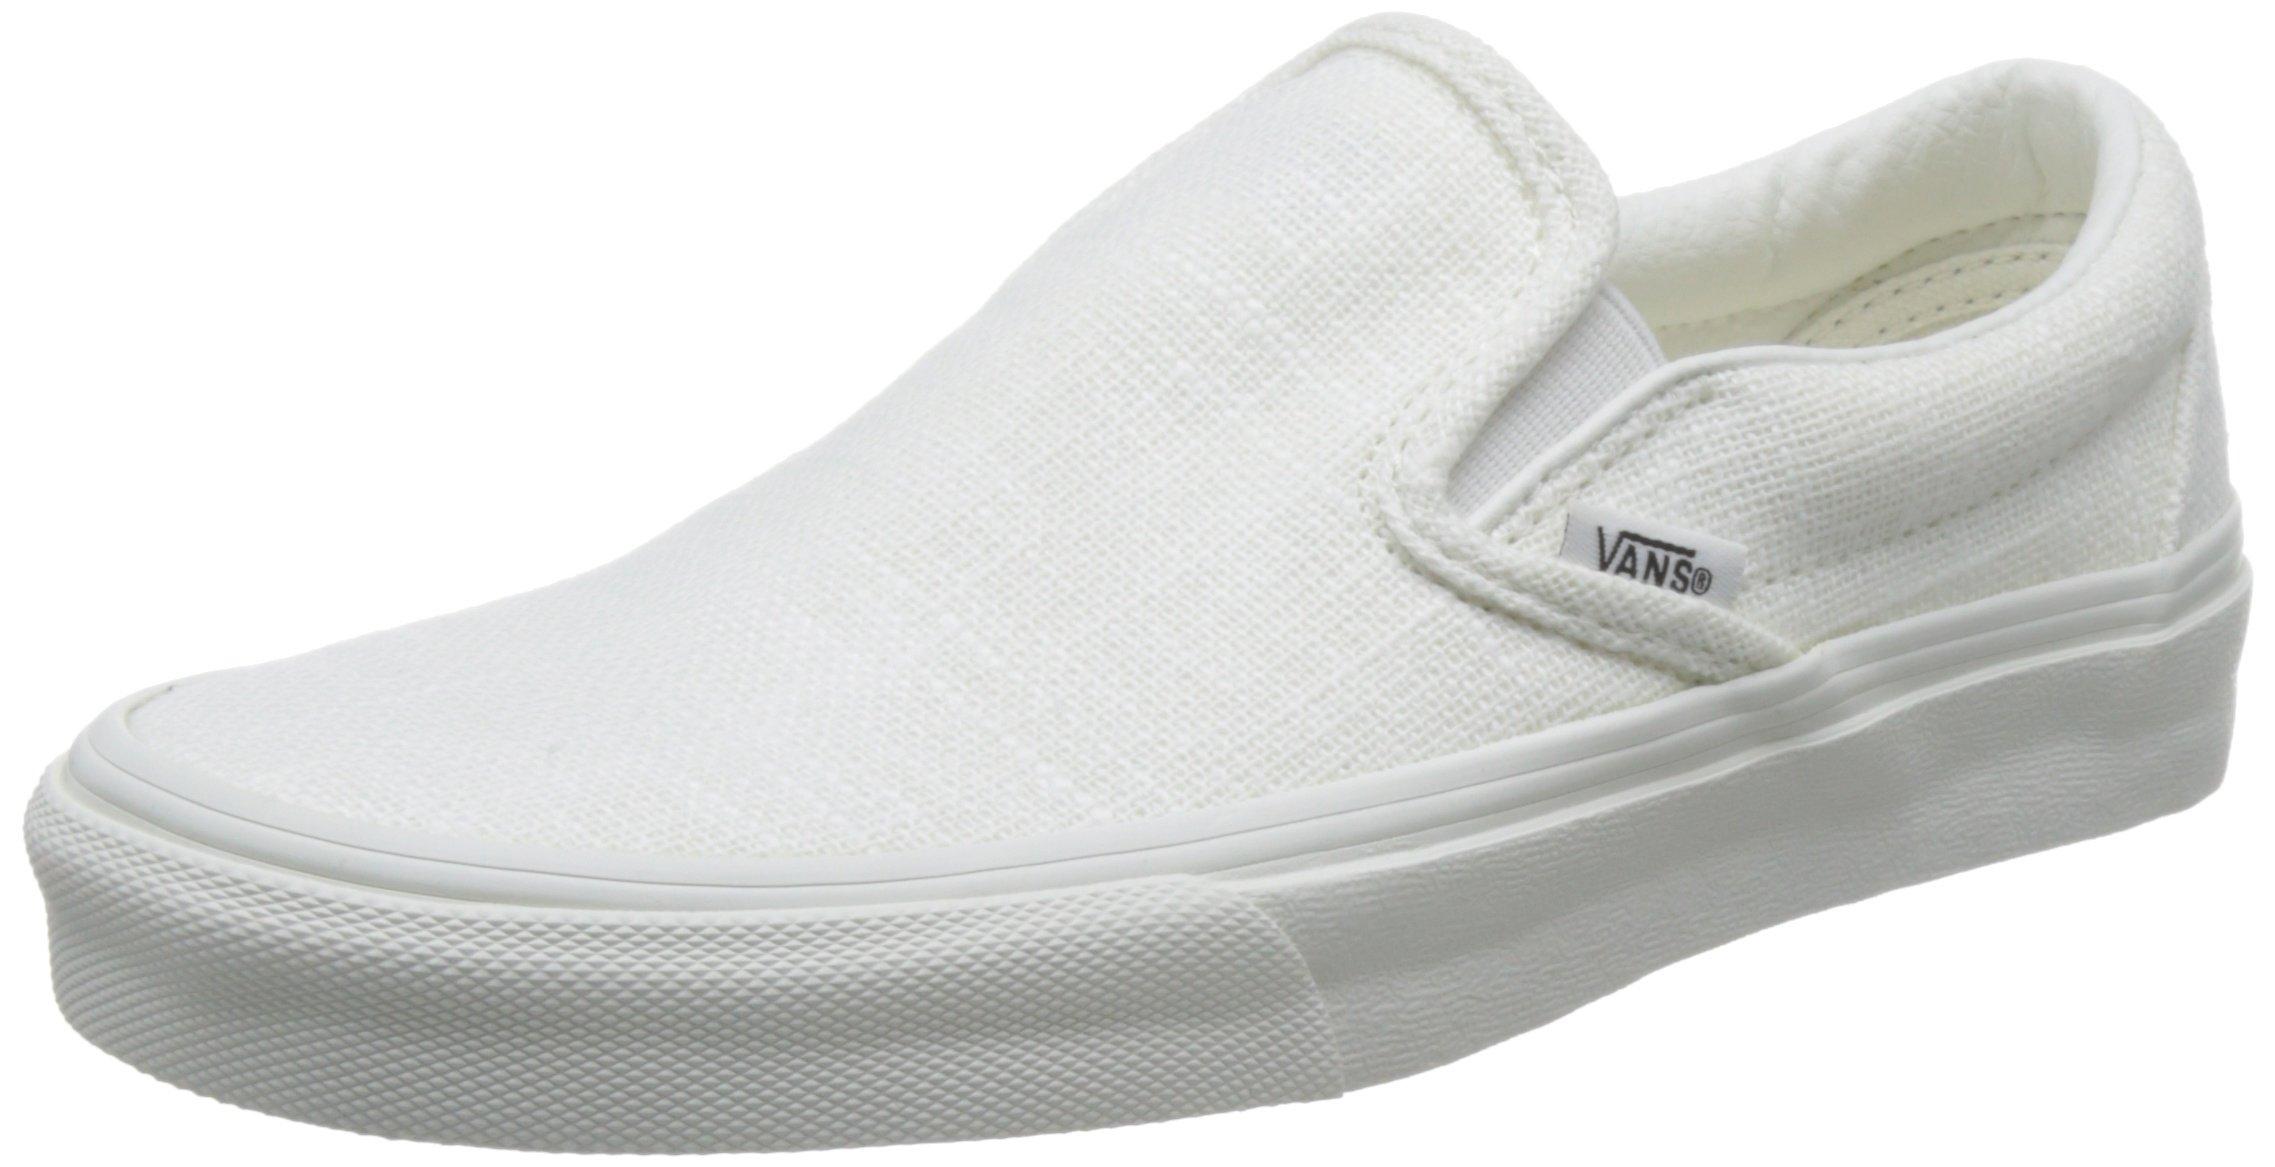 Vans Classic Slip On Hemp Linen Blanc de Blanc Sneakers (5 Mens/6.5 Womens, Blanc de Blanc)